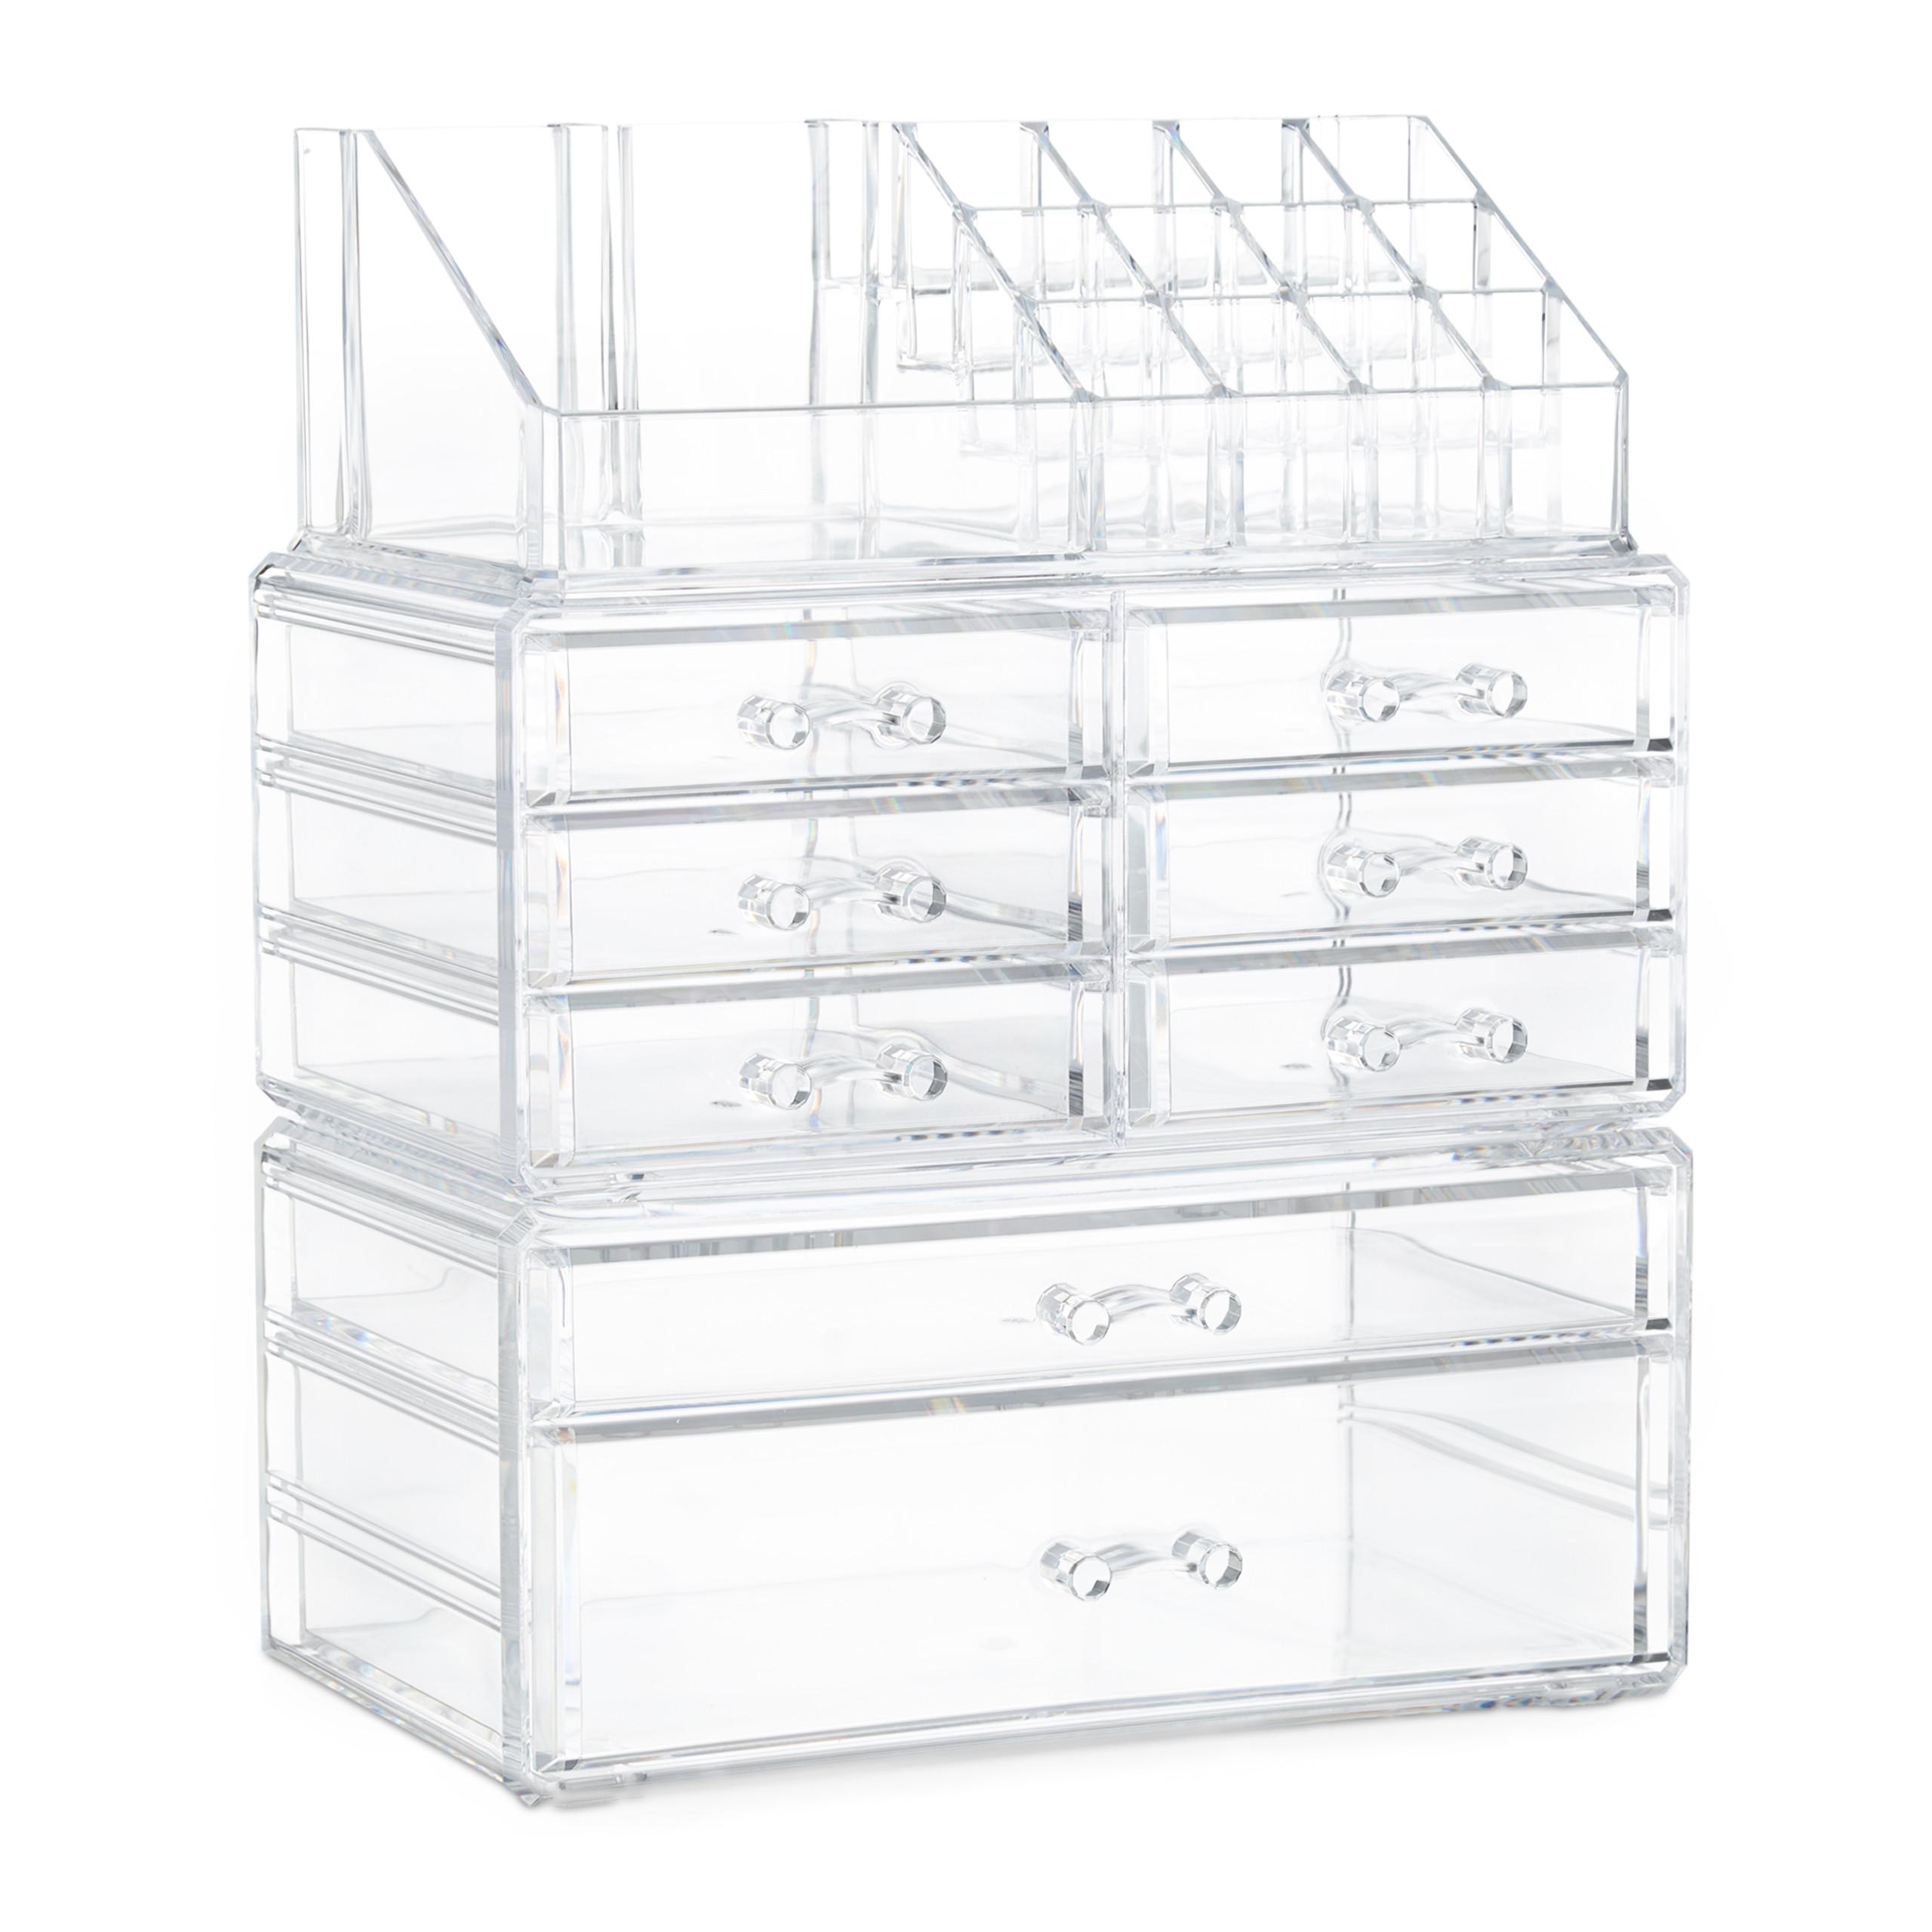 make-up-organizer-opbergen-van-cosmetica-acryl-stapelbaar-met-lades miniatuur 5